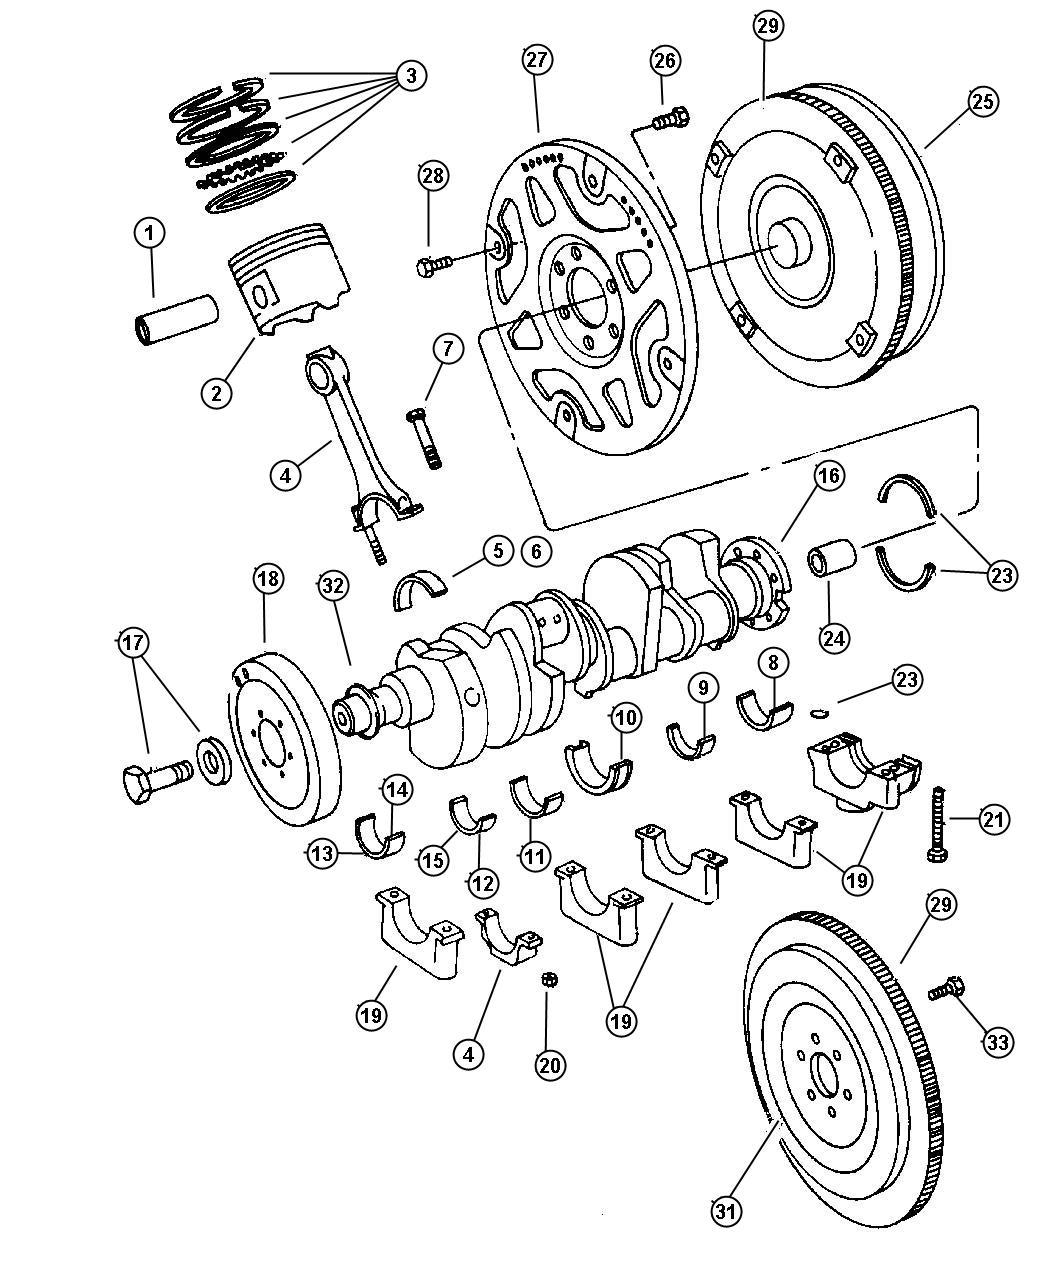 2007 Dodge Caliber Plate. Torque converter drive. Piston